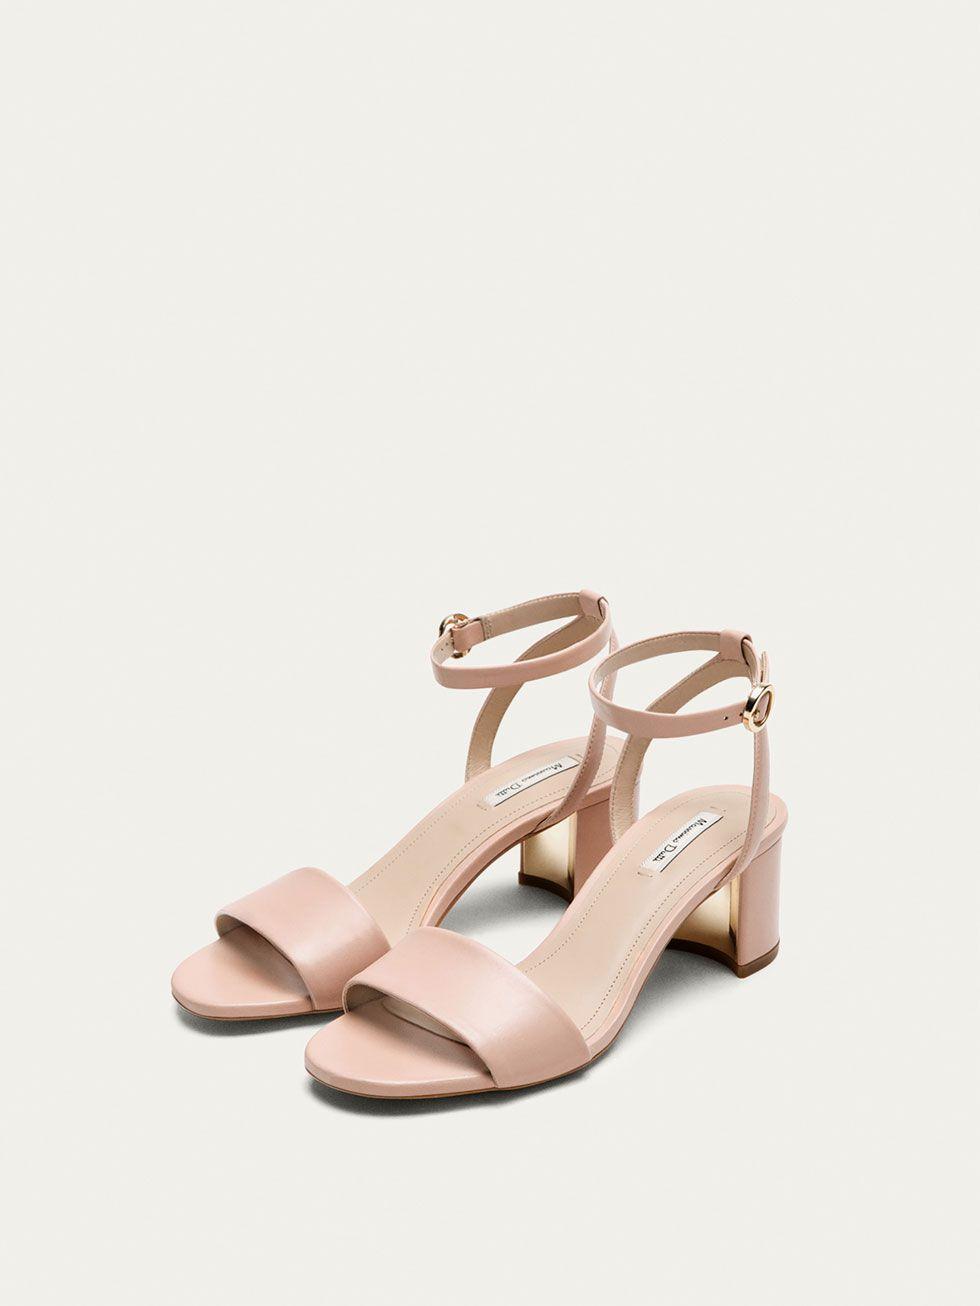 SANDALIA PIEL NAPA NUDE de MUJER - Zapatos de Massimo Dutti de Primavera  Verano 2017 por 69.95. ¡Elegancia natural! 914697569181